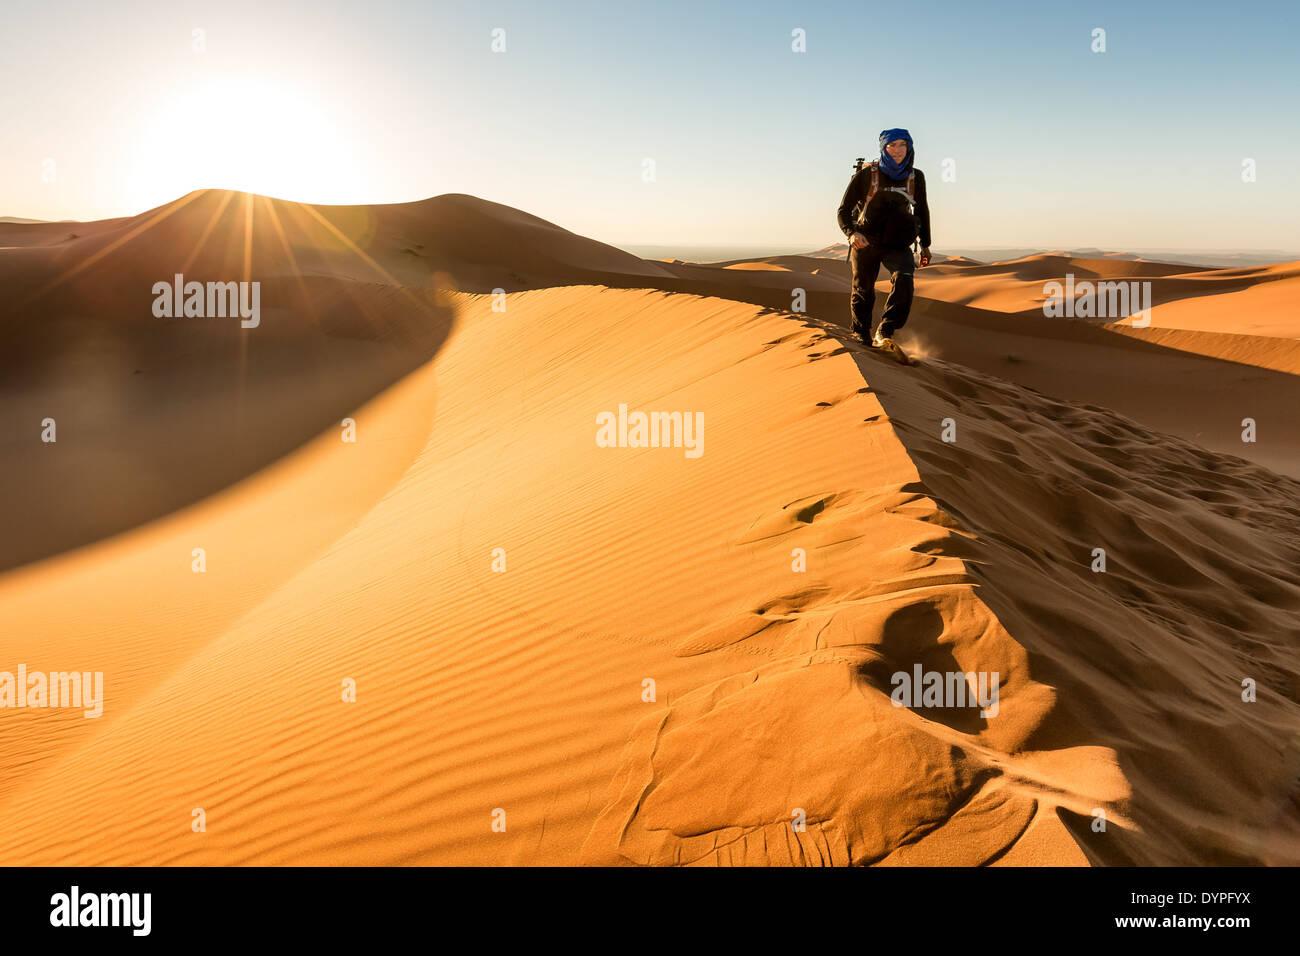 On dunes during sunrise at Erg Chebbi desert, Merzouga, Morocco, Africa - Stock Image